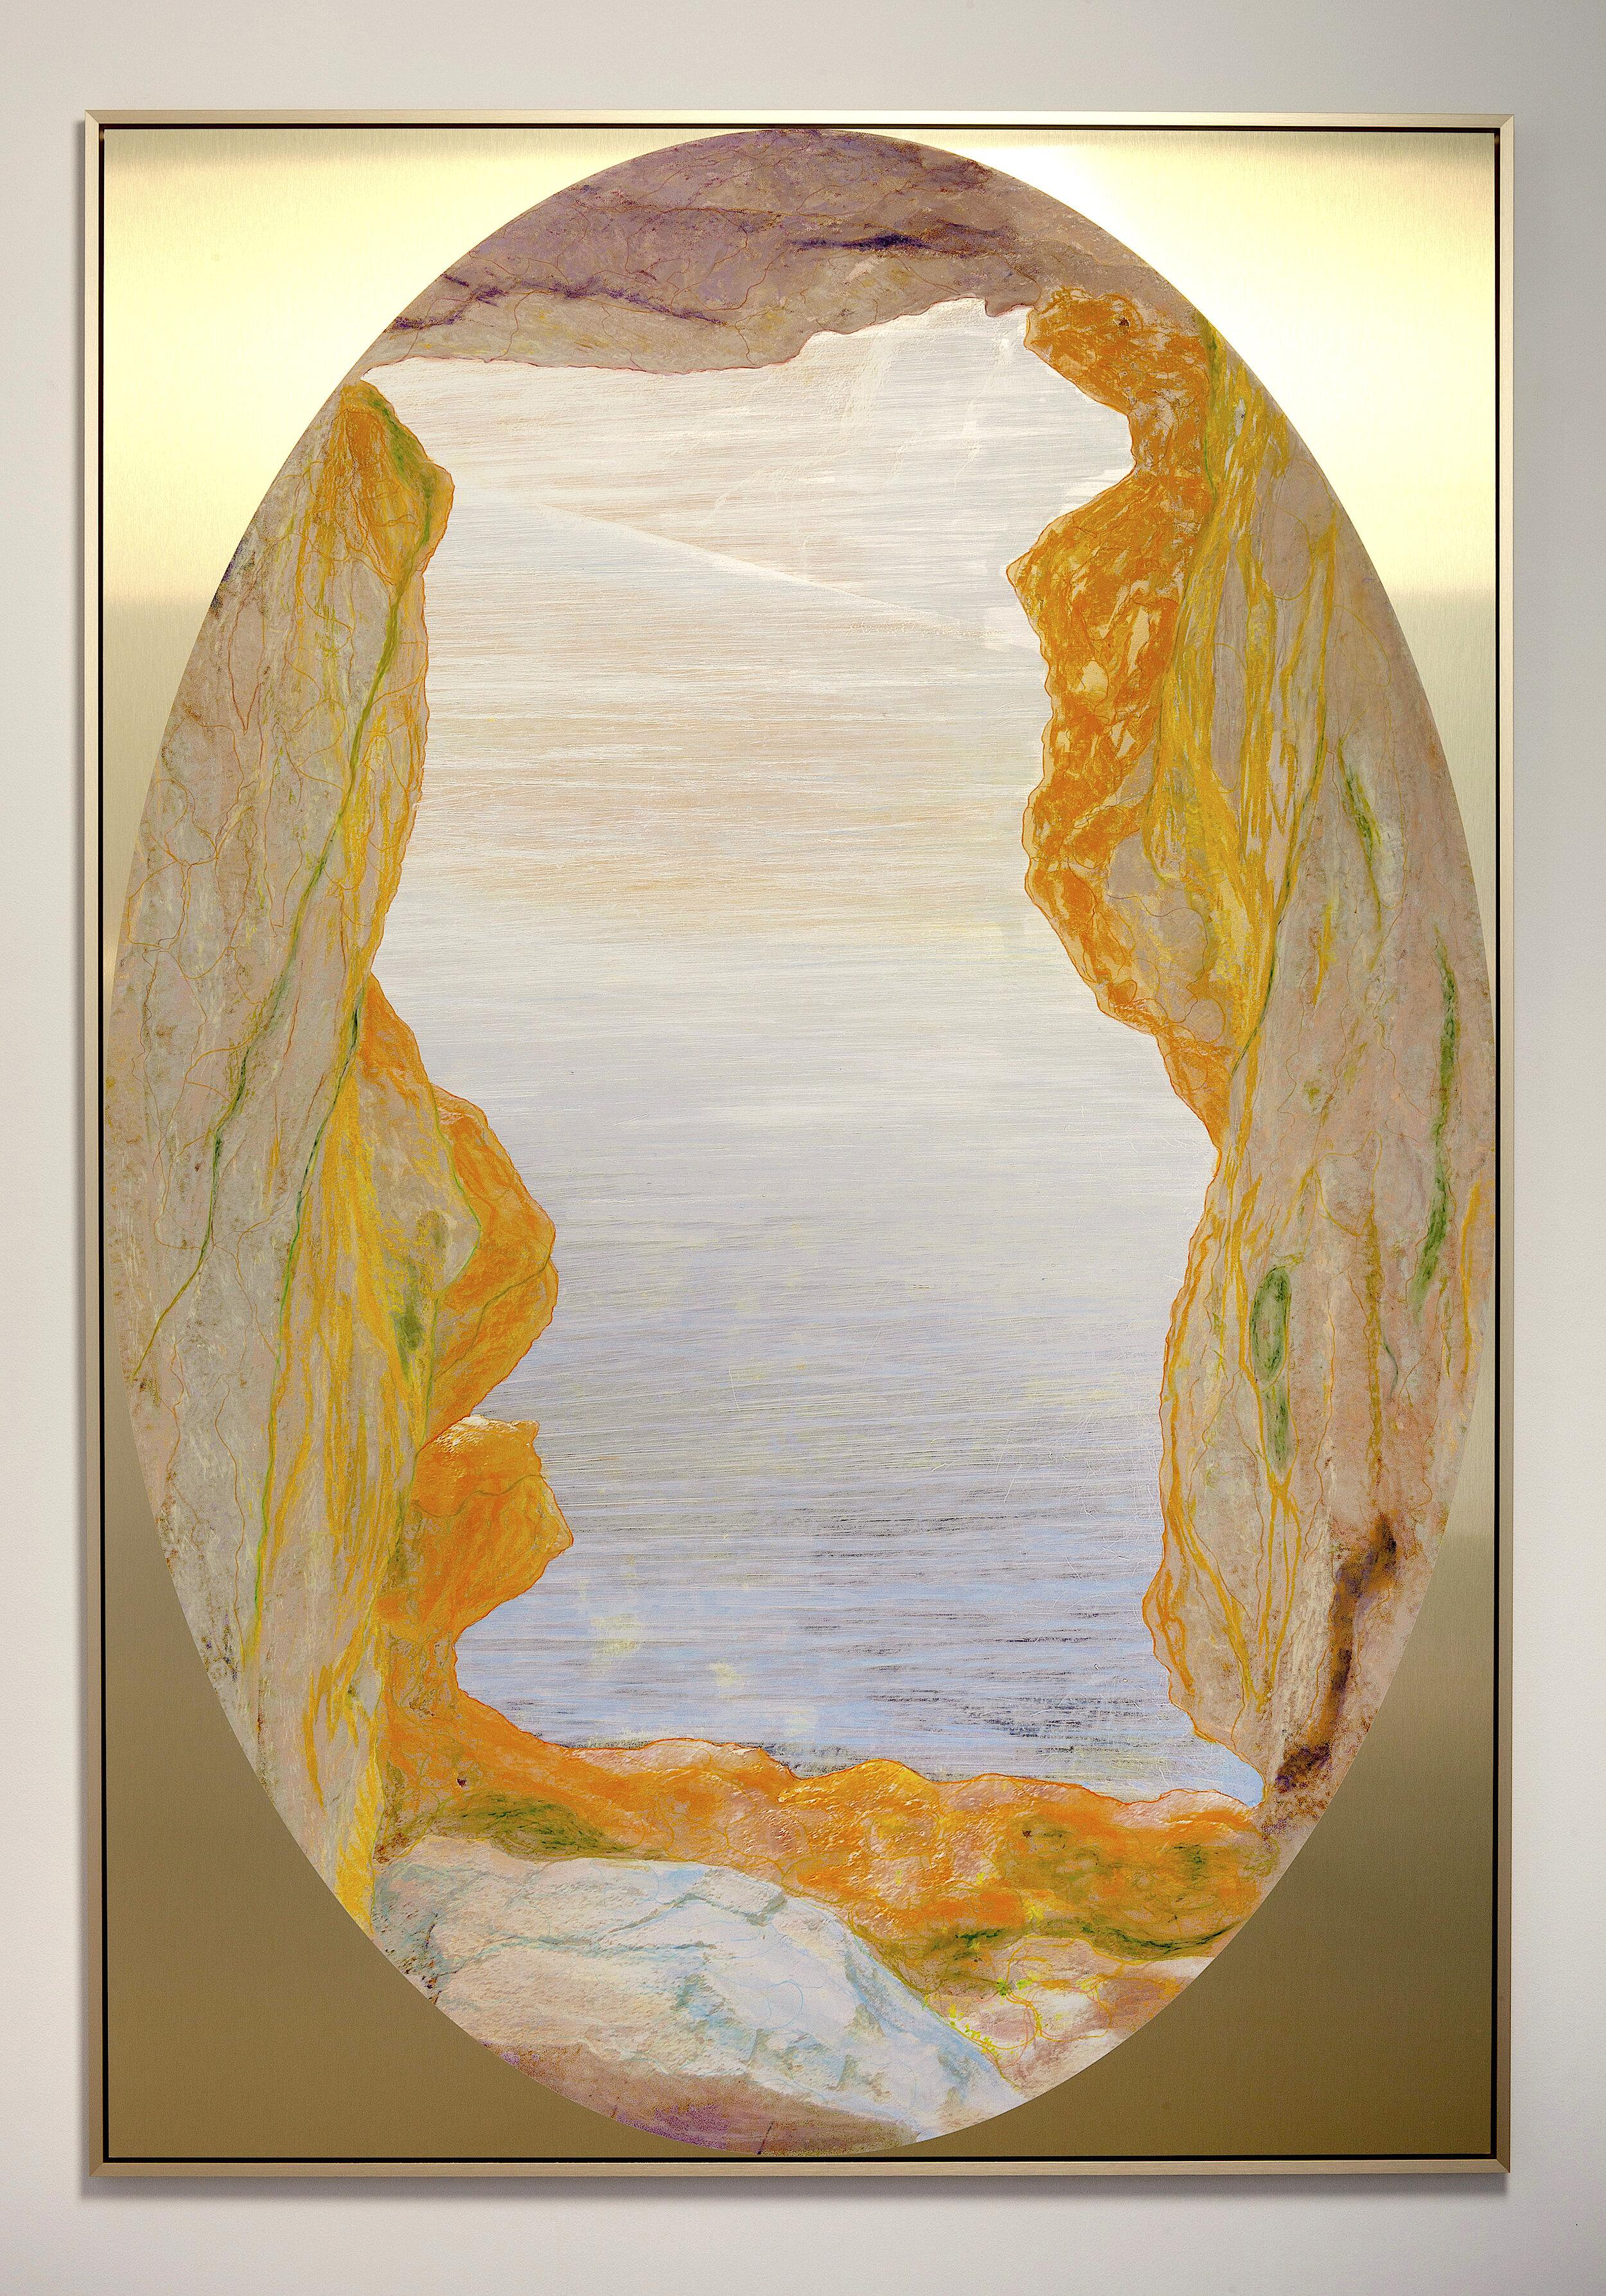 Beyond the Oecumene / Part XL,  2019 Wax pastels, UV-print on gold Alu-Dibond 190 x 120 cm (75 x 47 in)